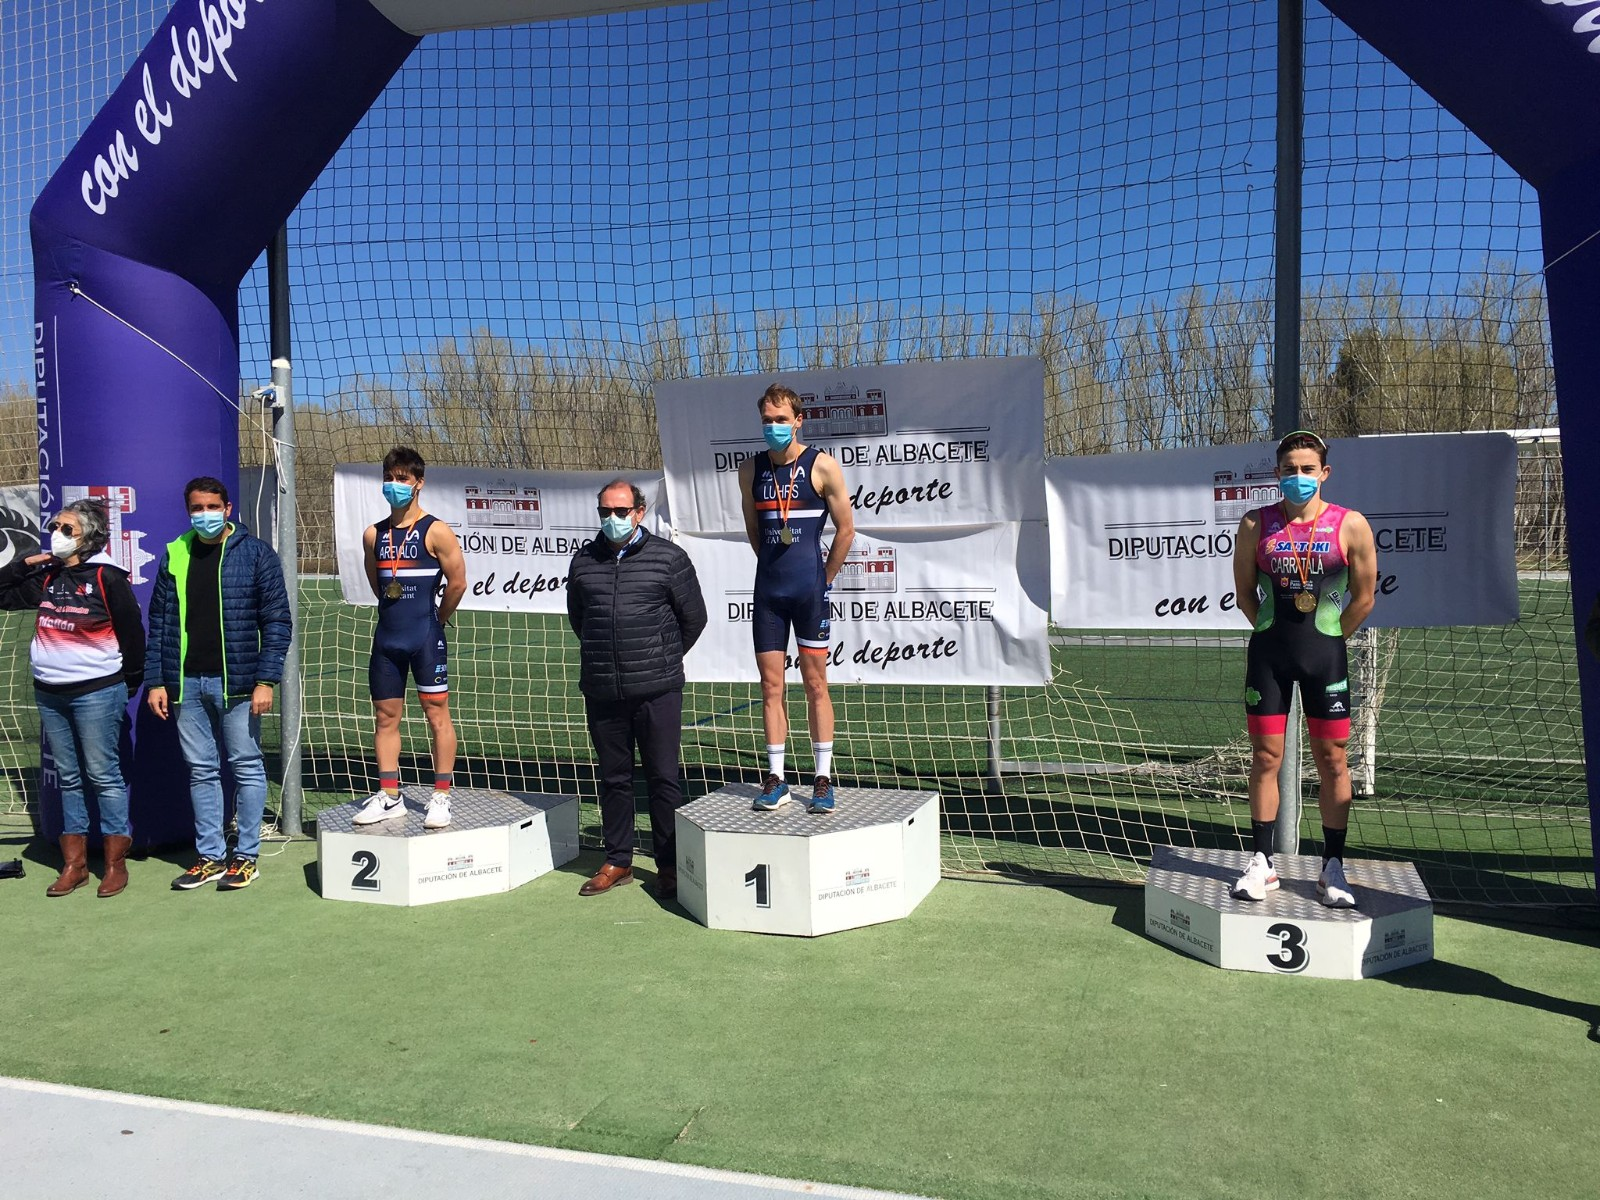 Celebrado en Almansa el Campeonato Regional de Duatlón